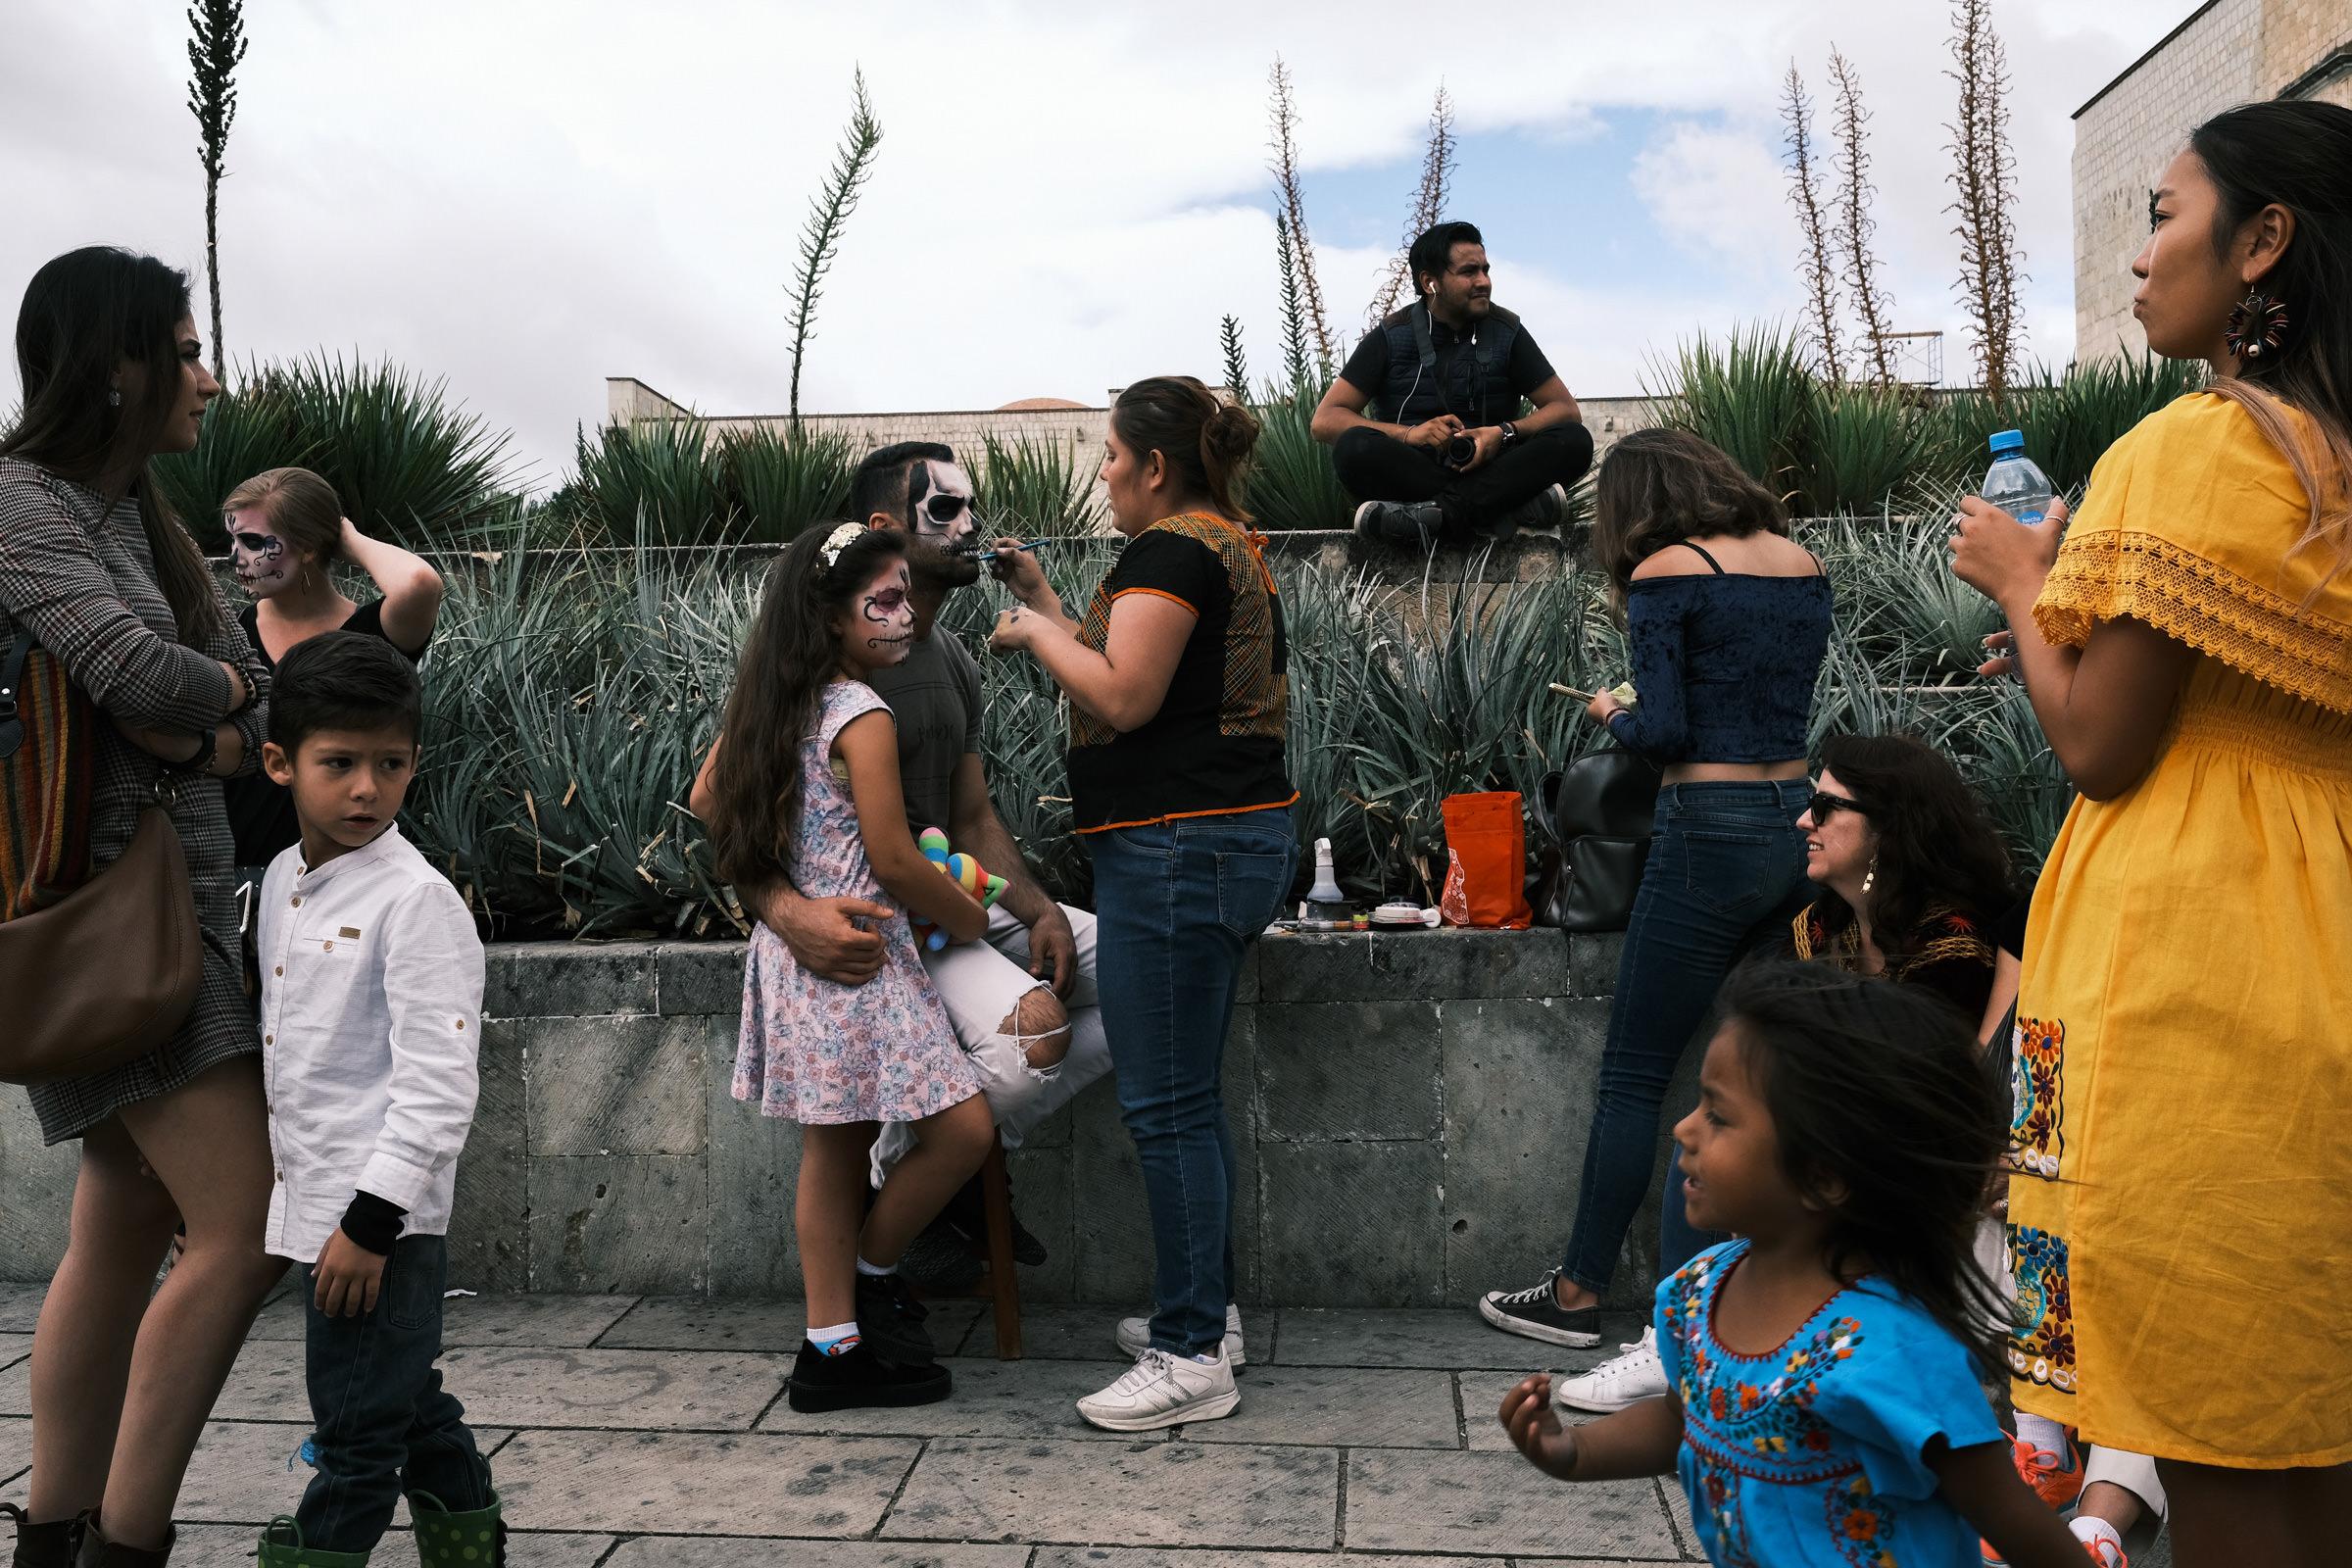 Mexico-Street-Photography-23